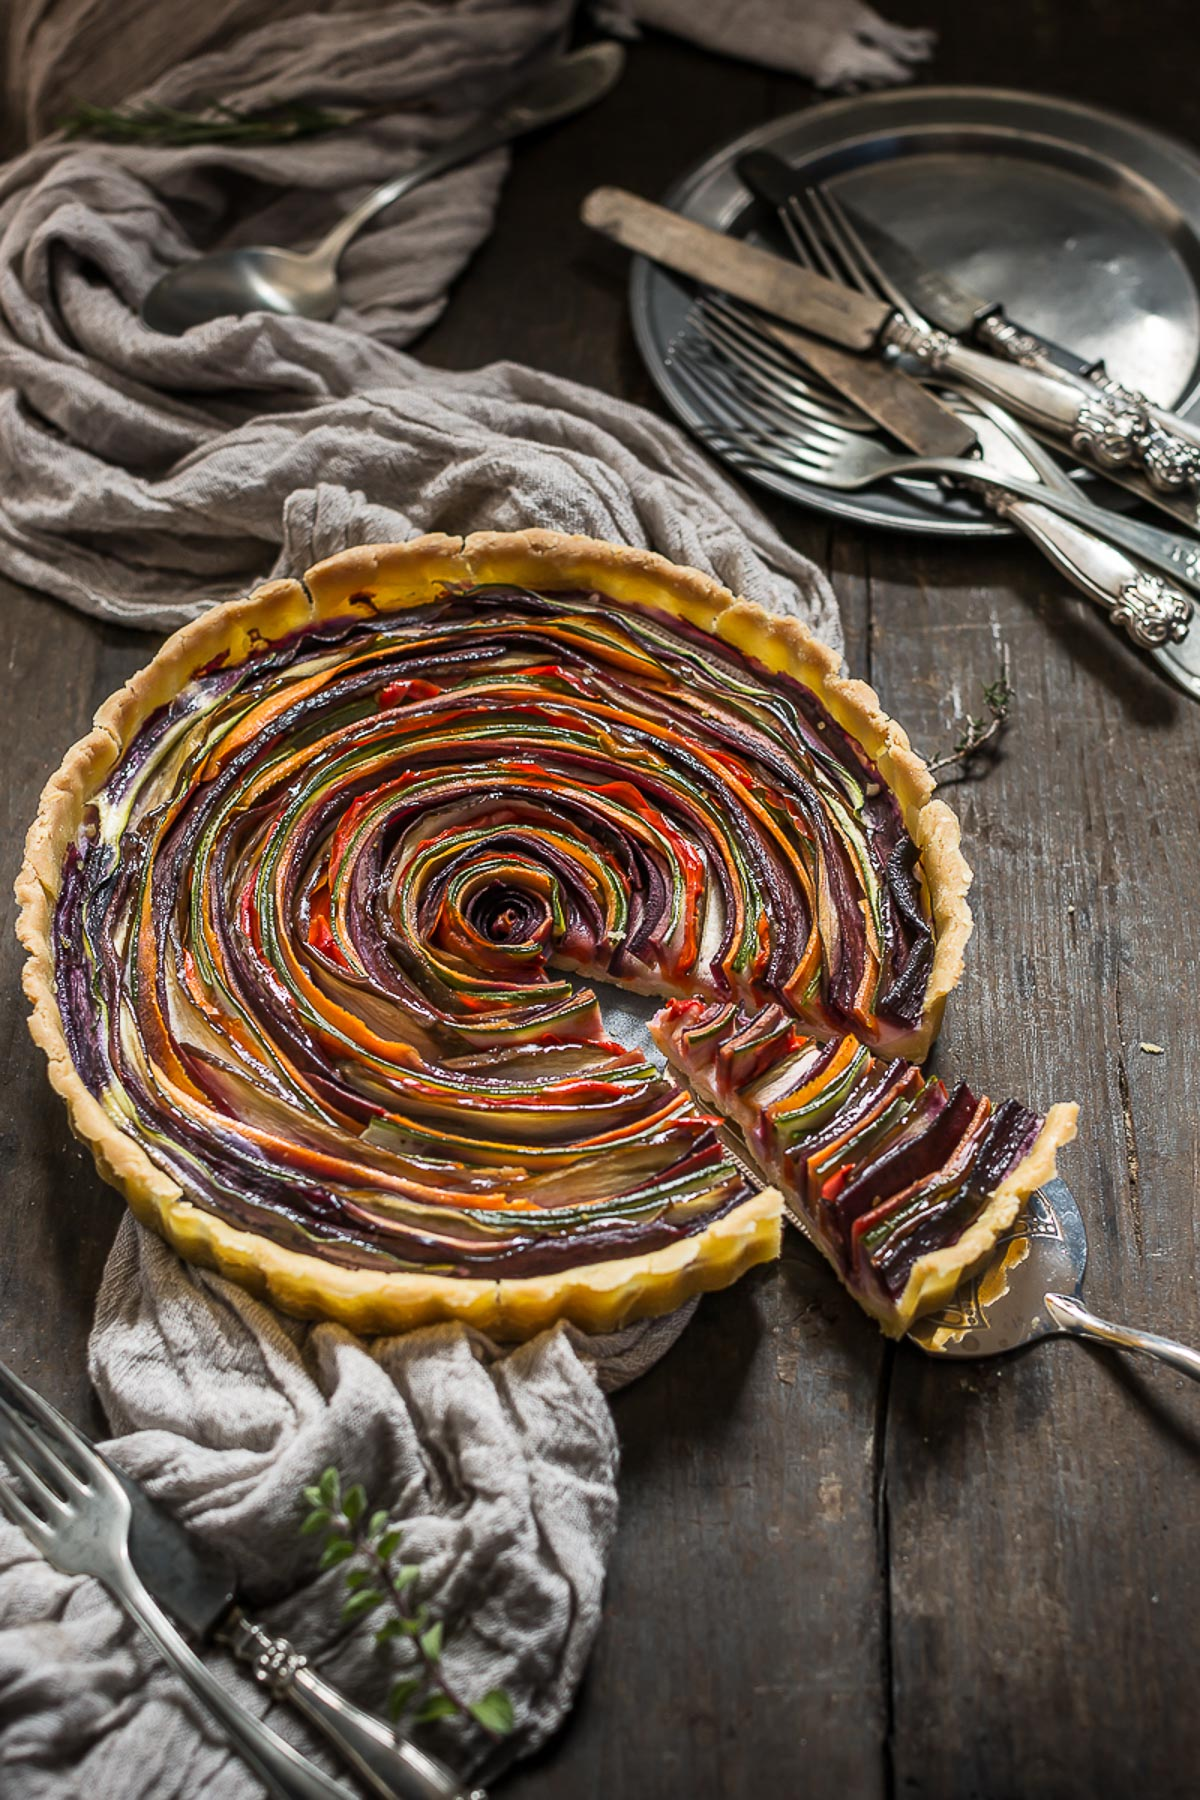 torta salata di verdure a spirale senza glutine senza uova senza burro #vegan | vegan #glutenfree vegetable spiral tart photography